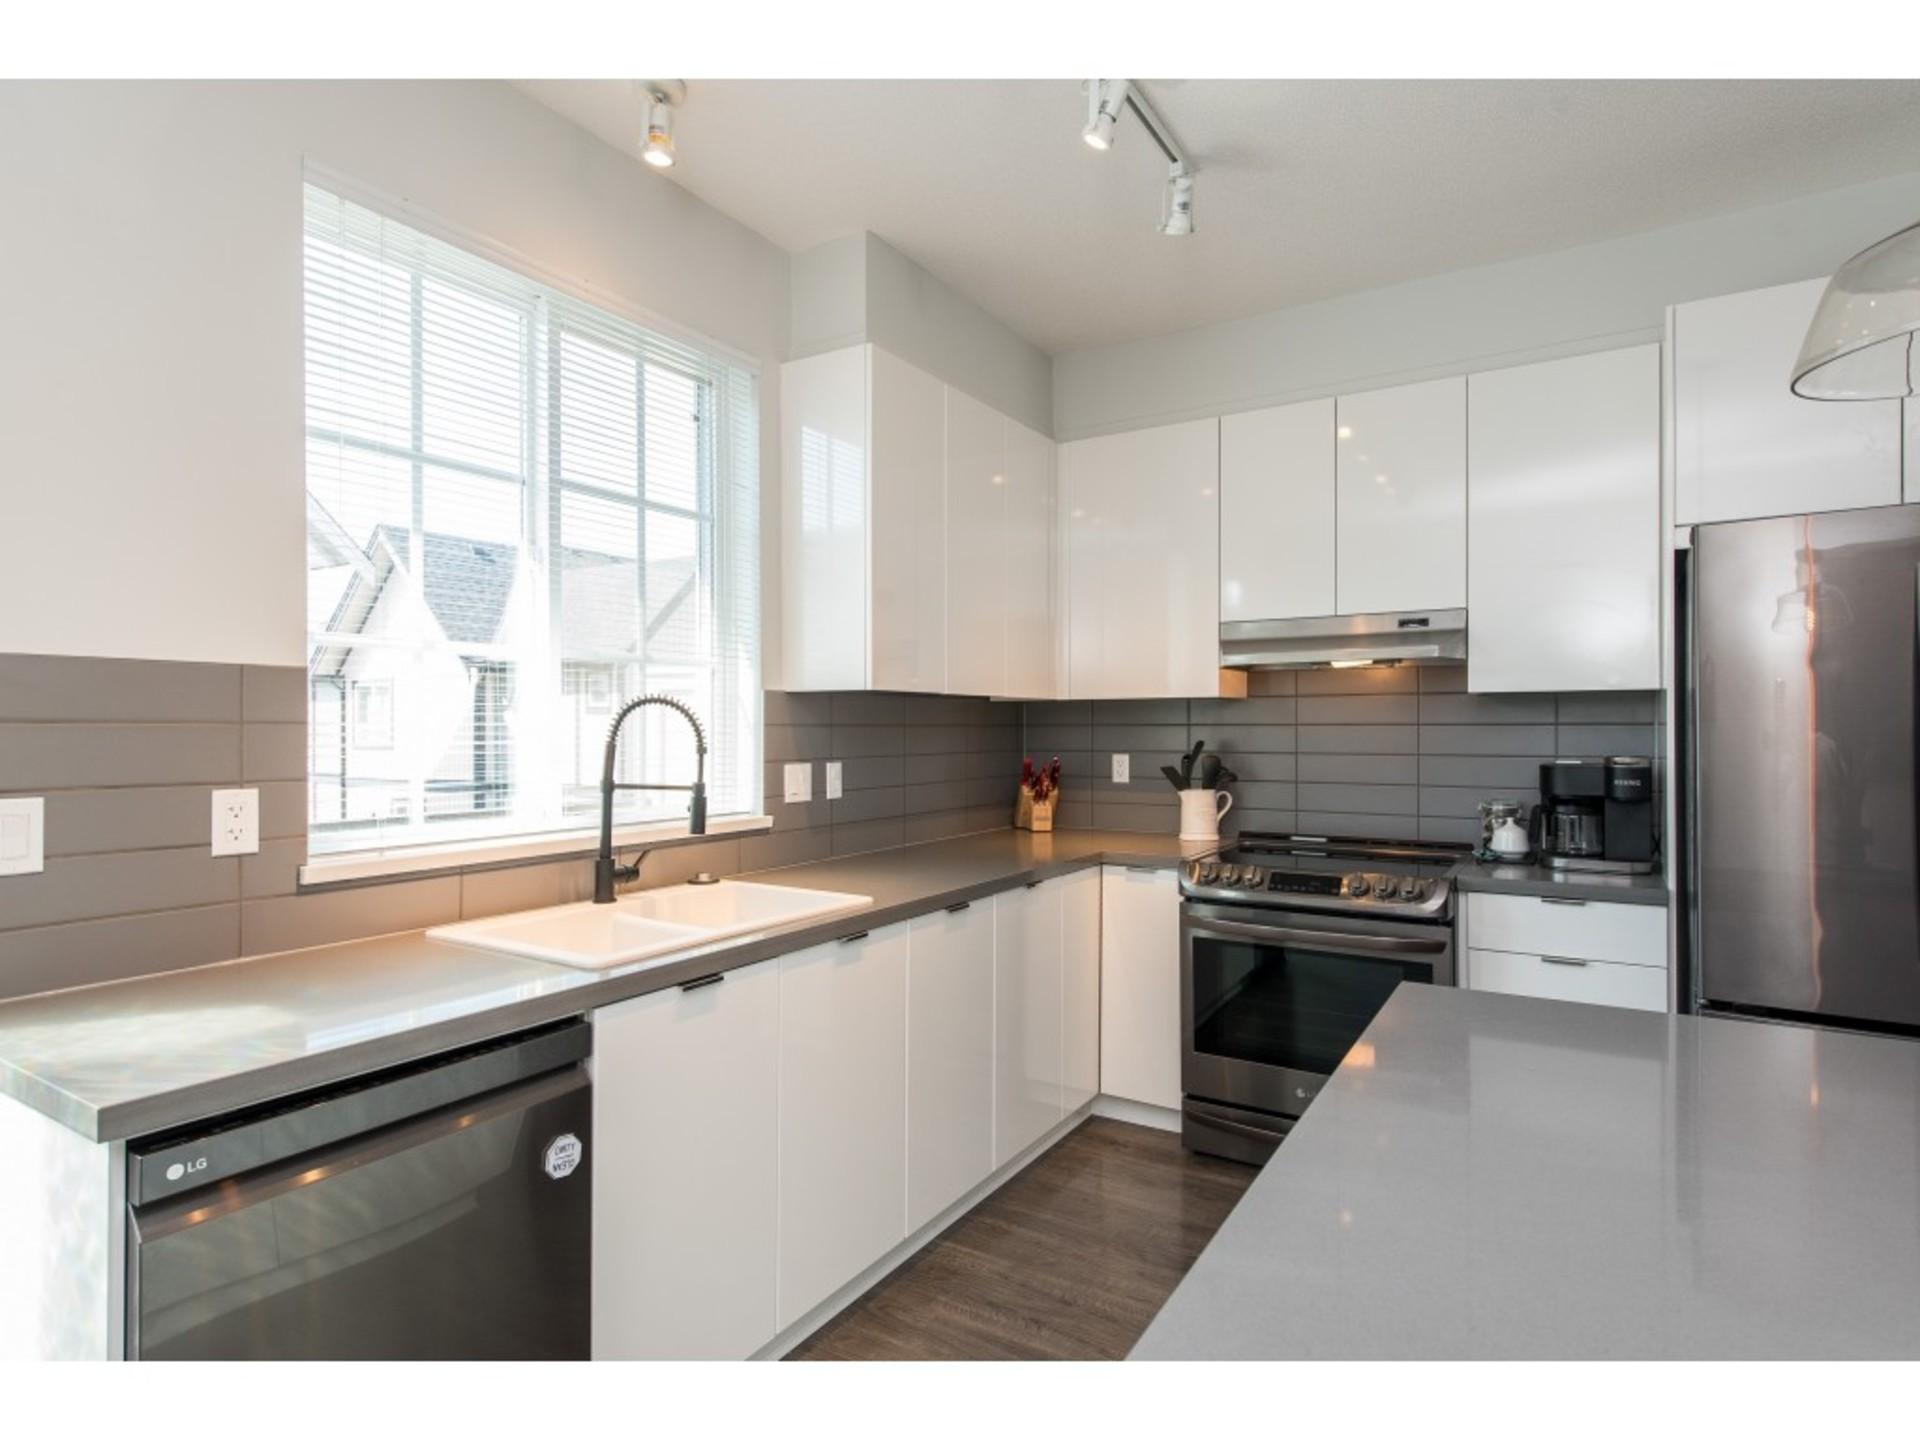 Kitchen at 94 - 30989 Westridge Place, Abbotsford West, Abbotsford